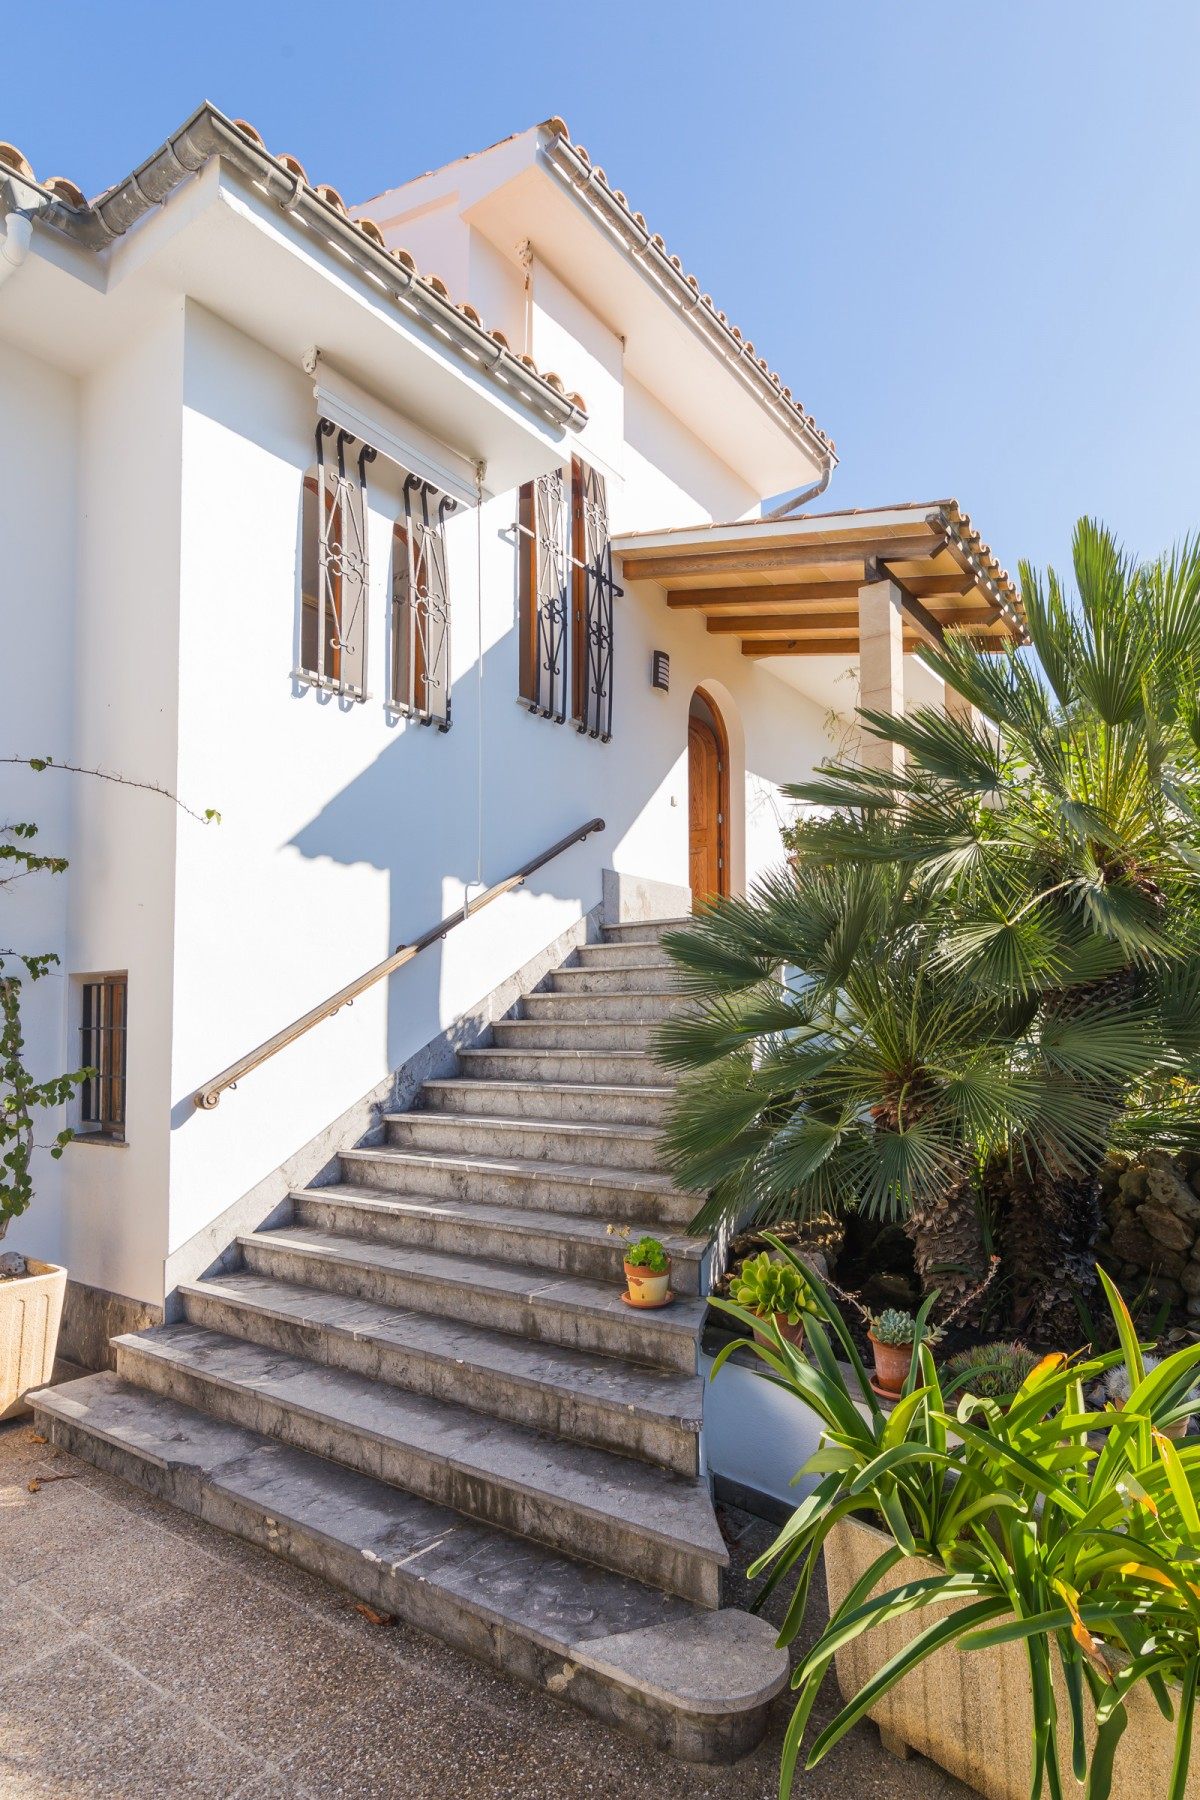 Franciscus for 8 guests in Playa de Muro, Spain